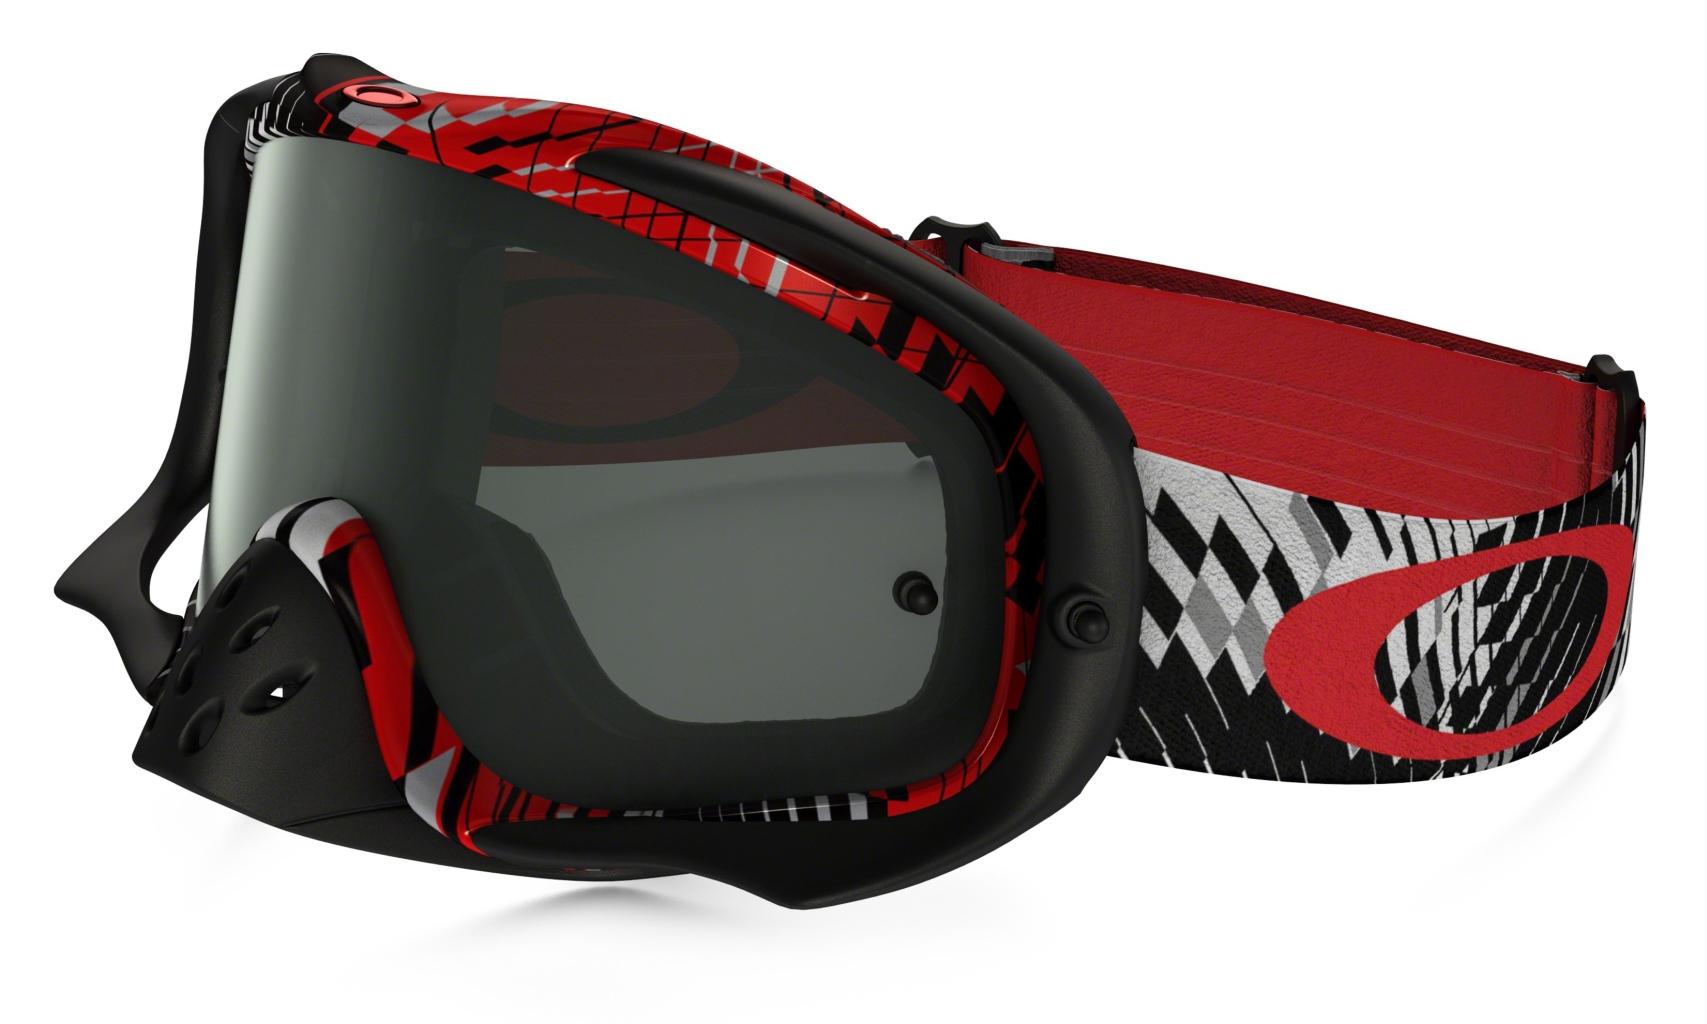 386c386d56 Oakley Crowbar Mx Frame  PODIUM CHECK RED BLACK Lens  DARK GREY - au